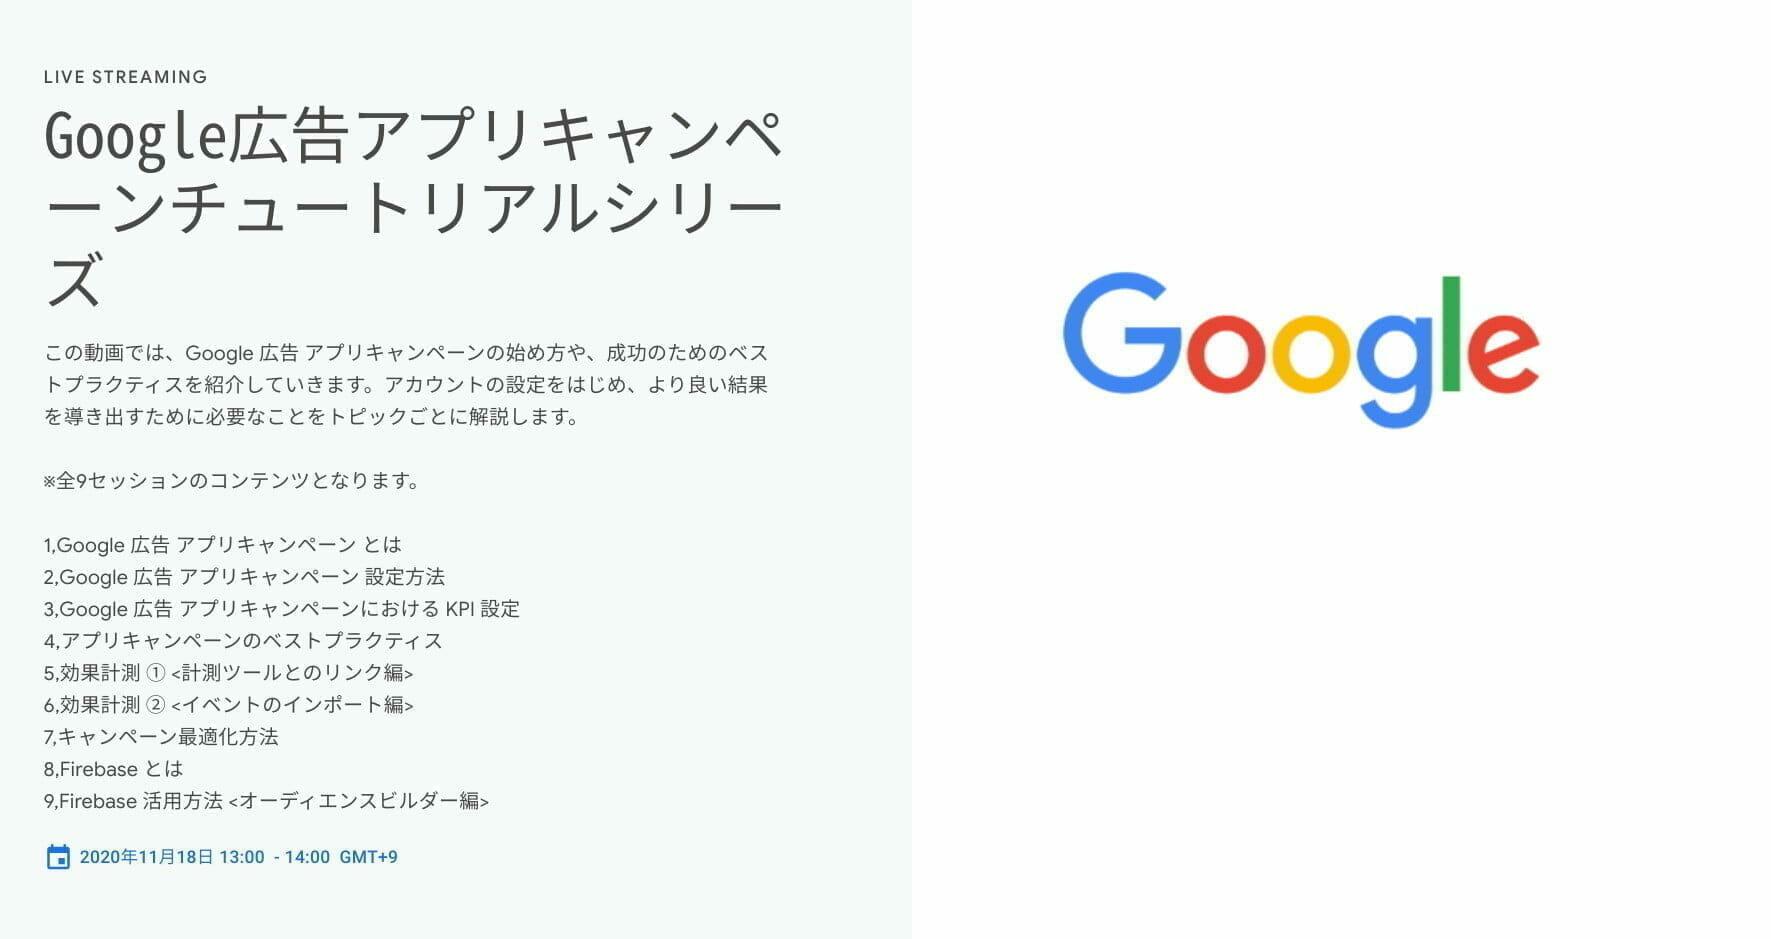 Google広告アプリキャンペーンチュートリアルシリーズ